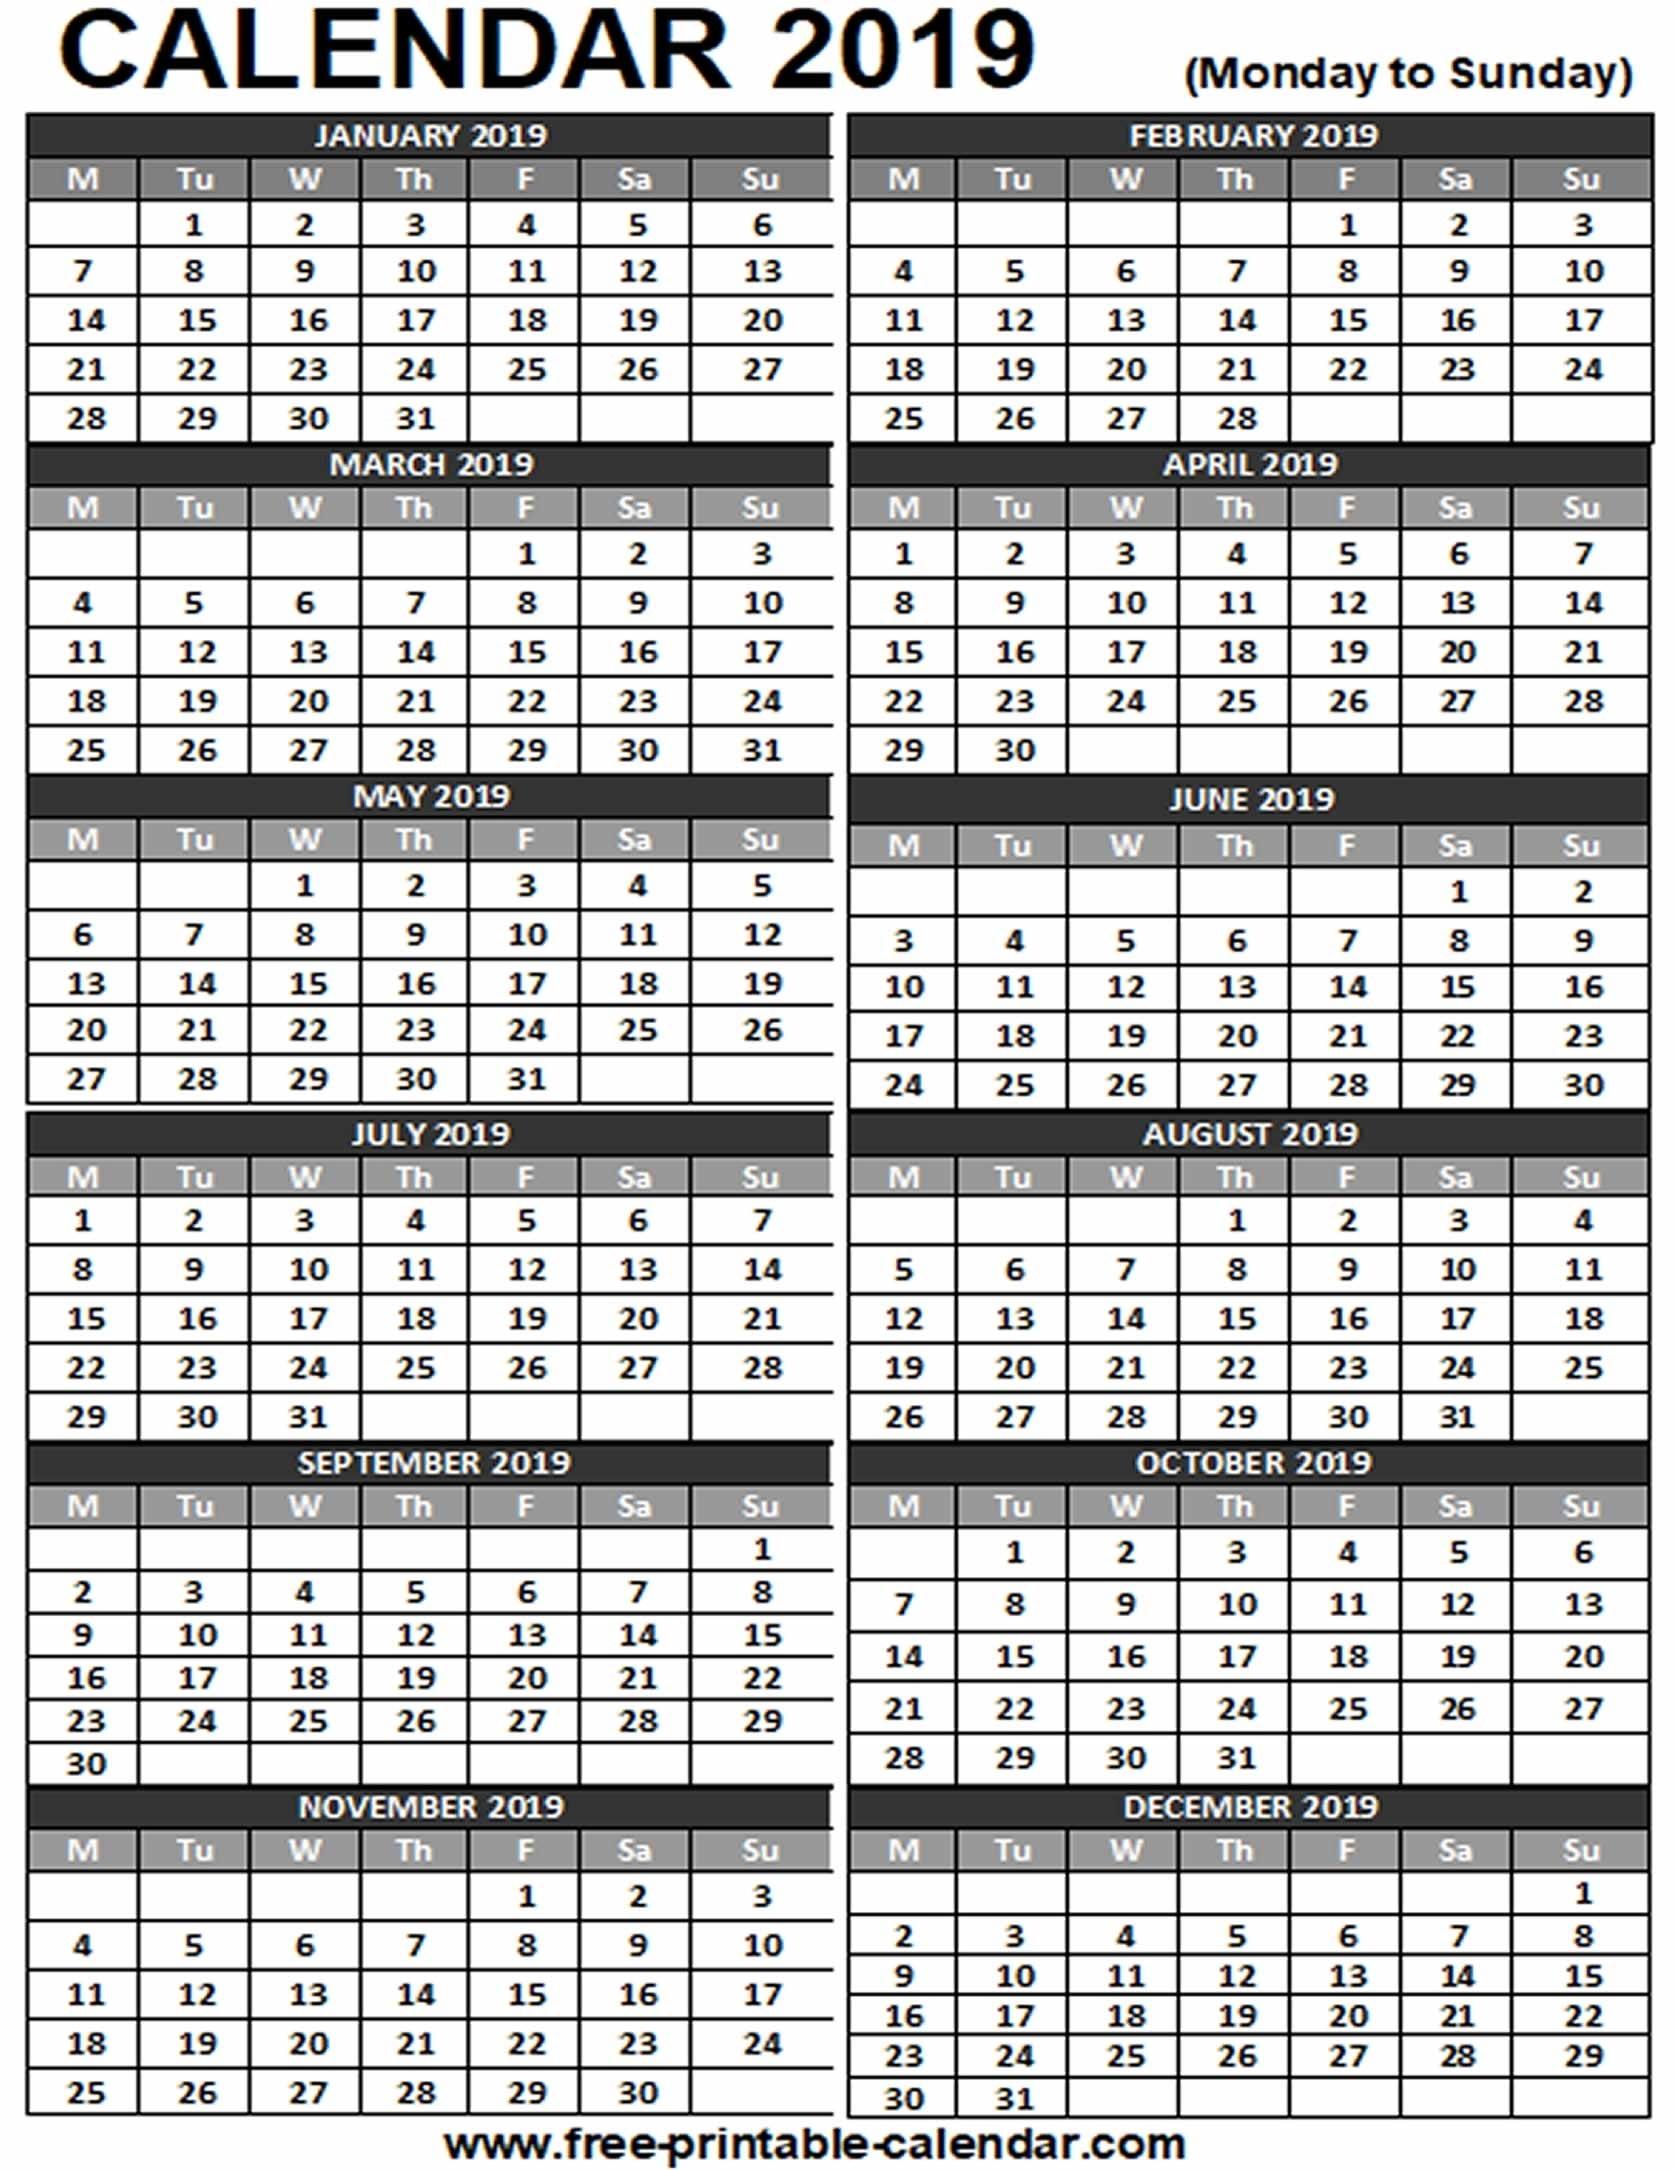 2019 Printable Calendar - Free-Printable-Calendar with 12 Month Calendar On One Page